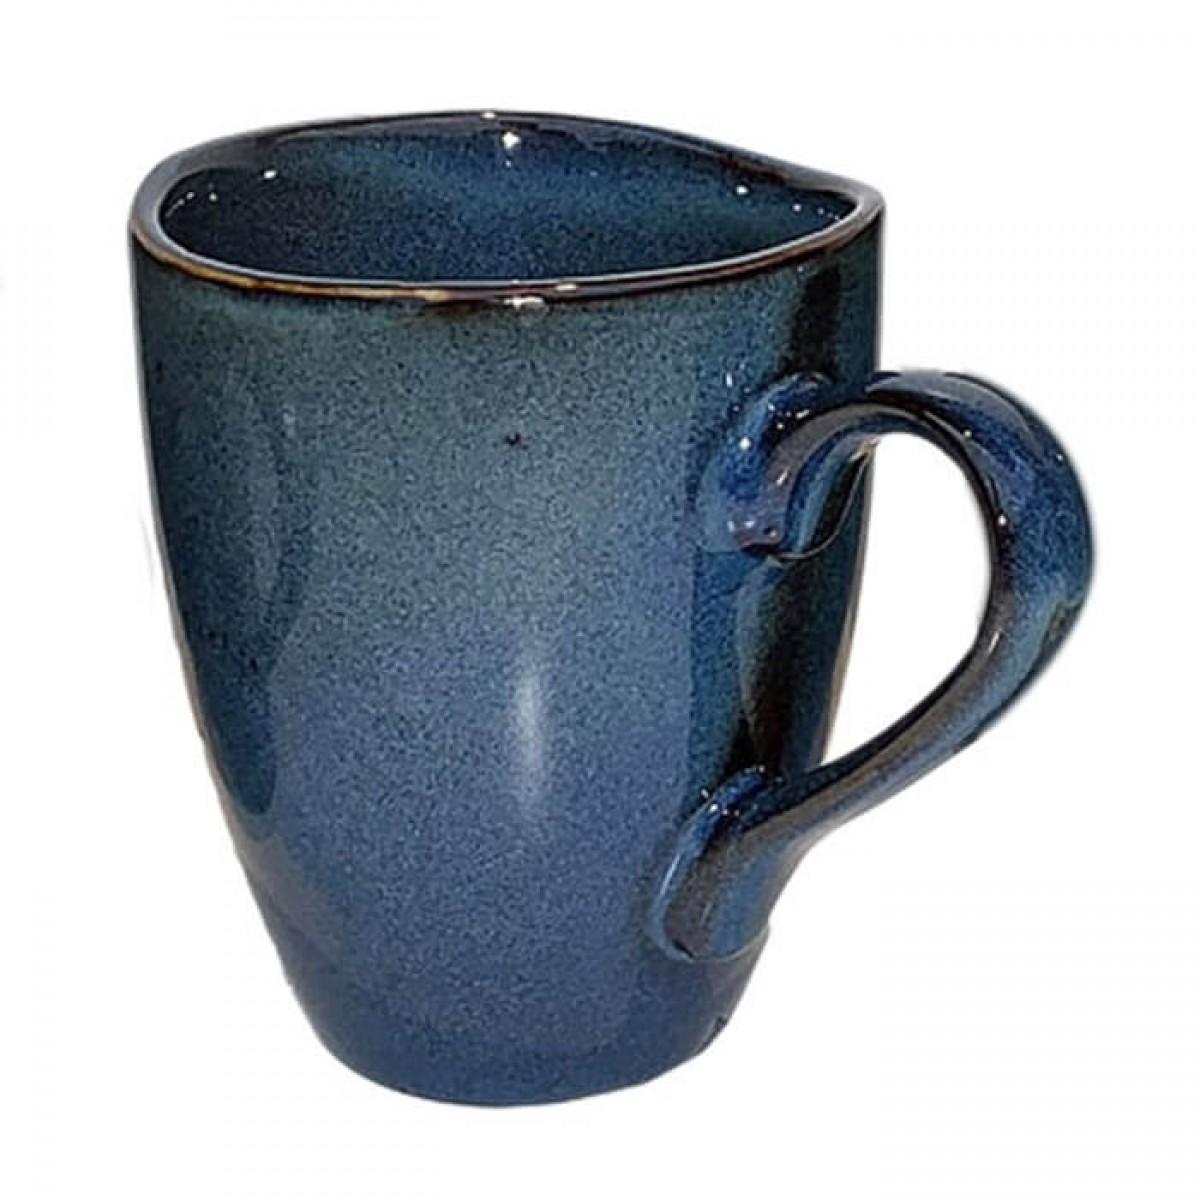 DACORE krus med hank stentøj 8 x 10 cm blå